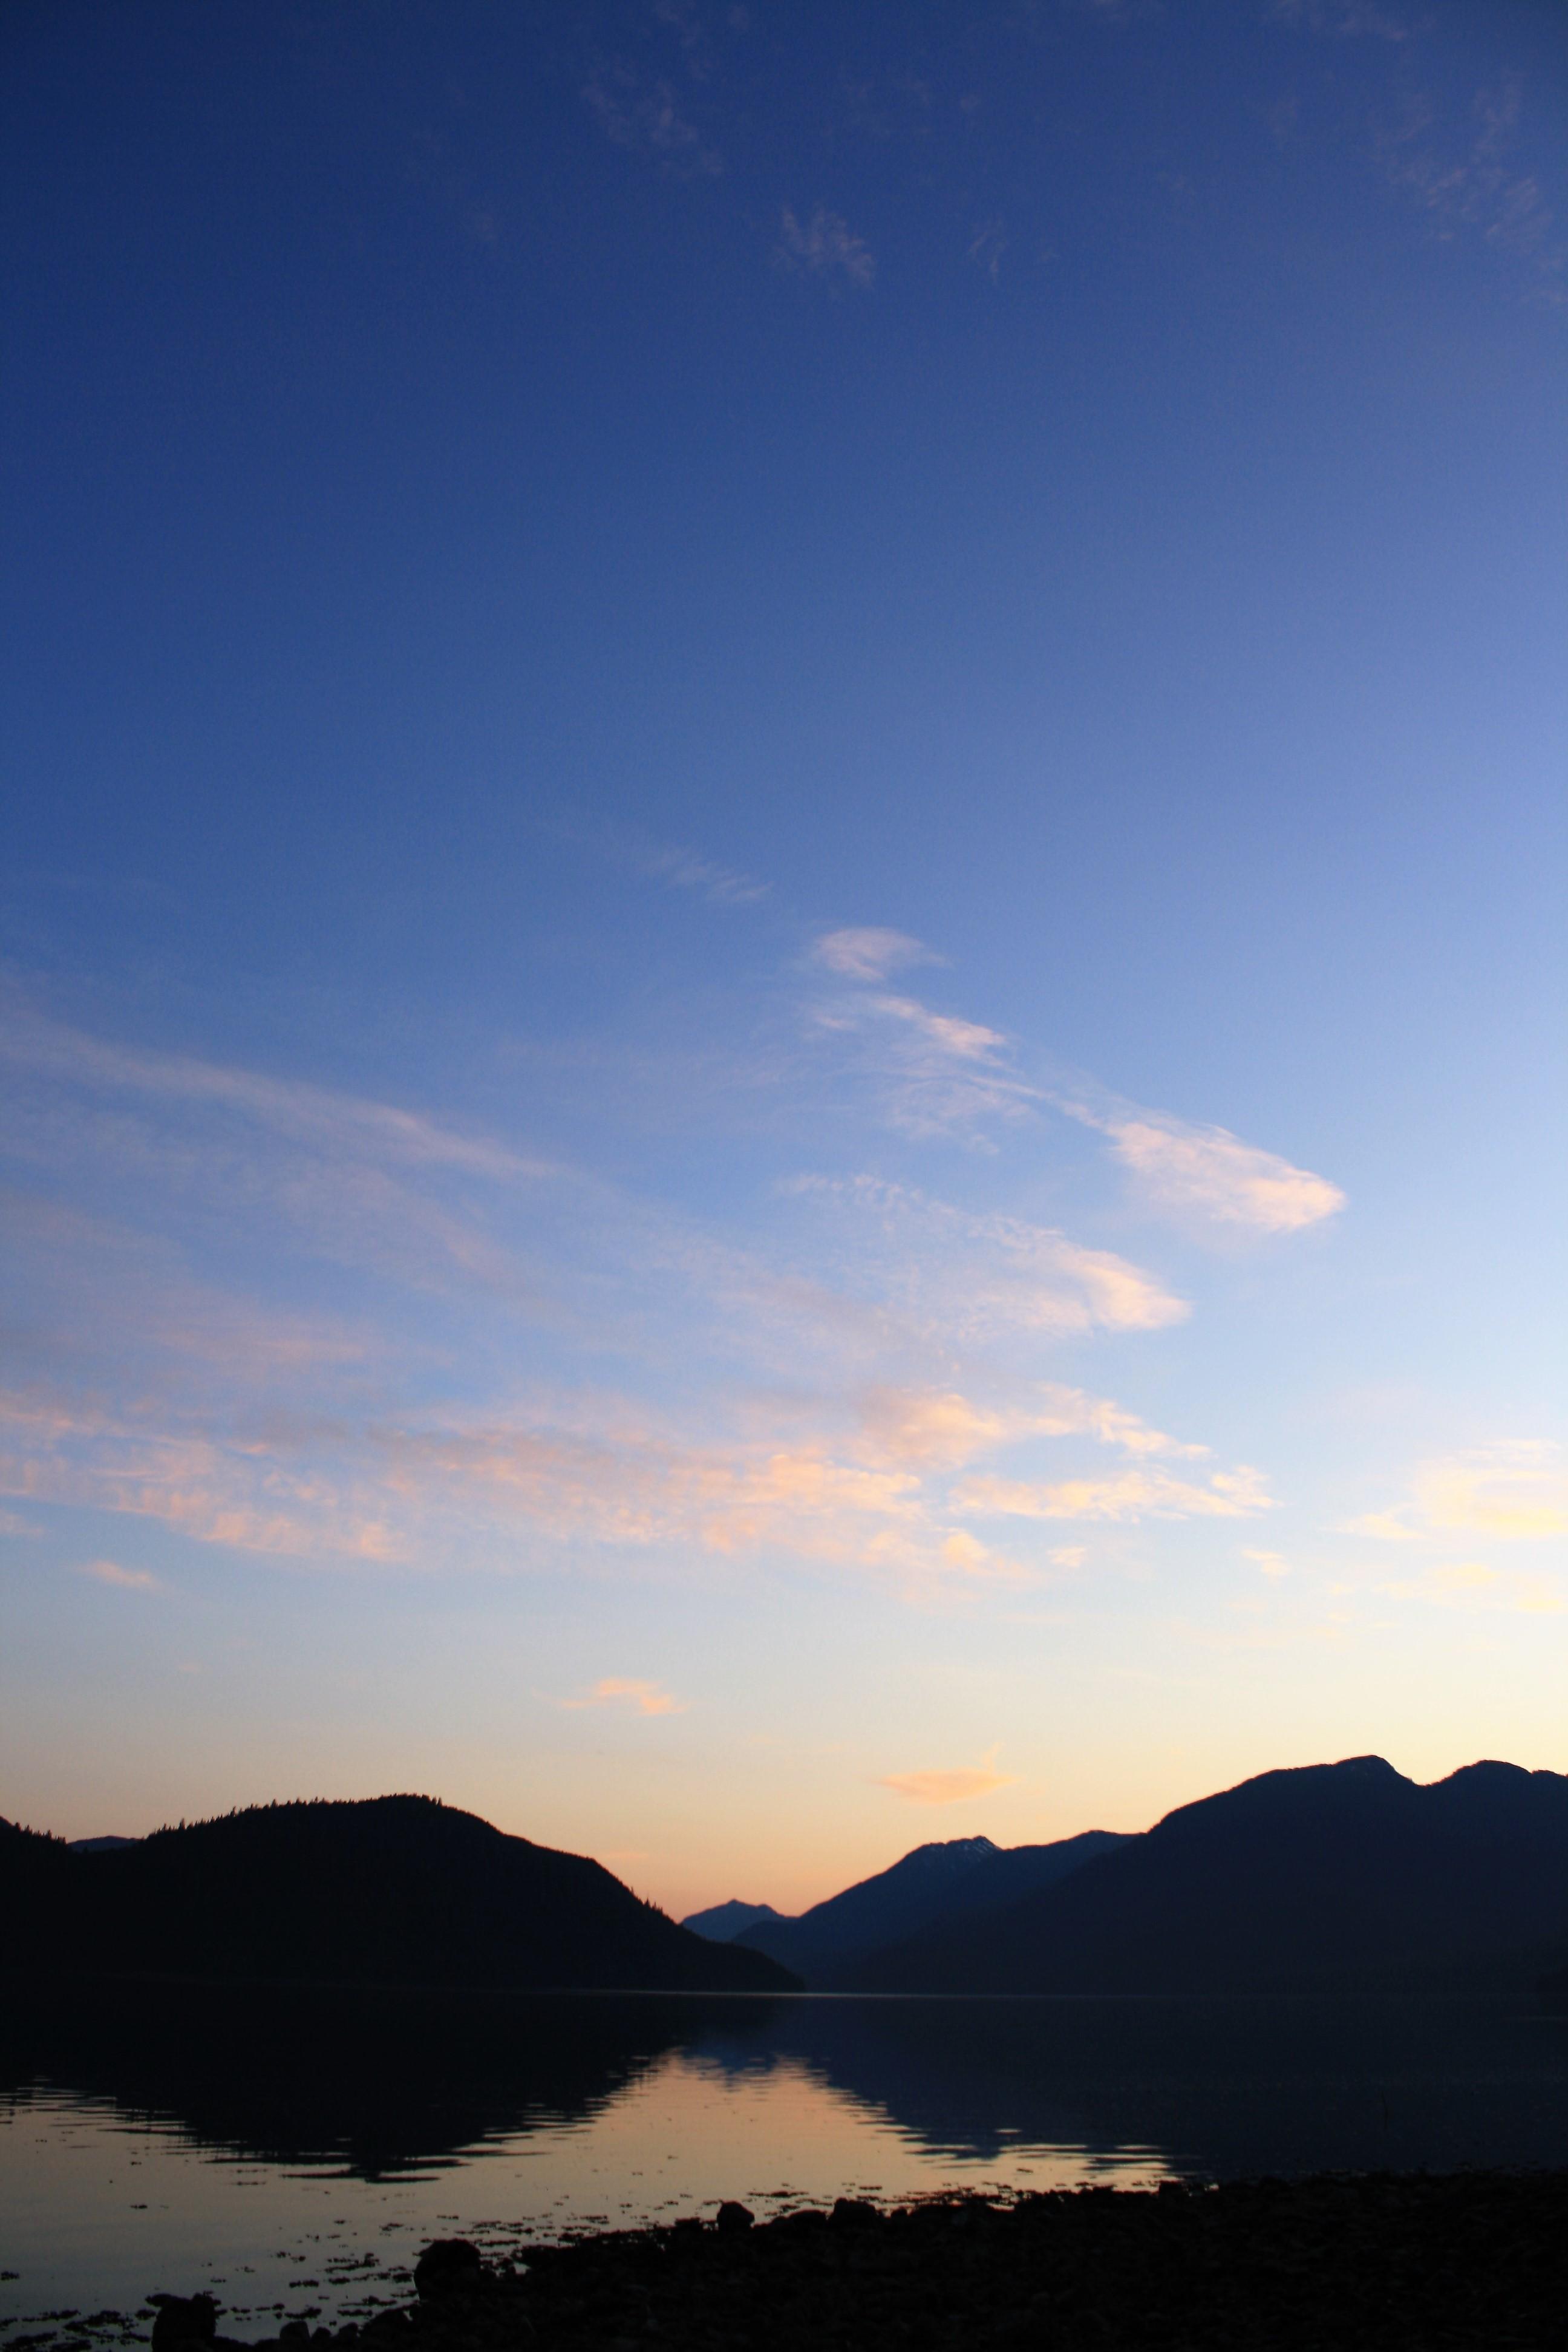 DM_nature_sunsetssunrises_haidagwaii_643